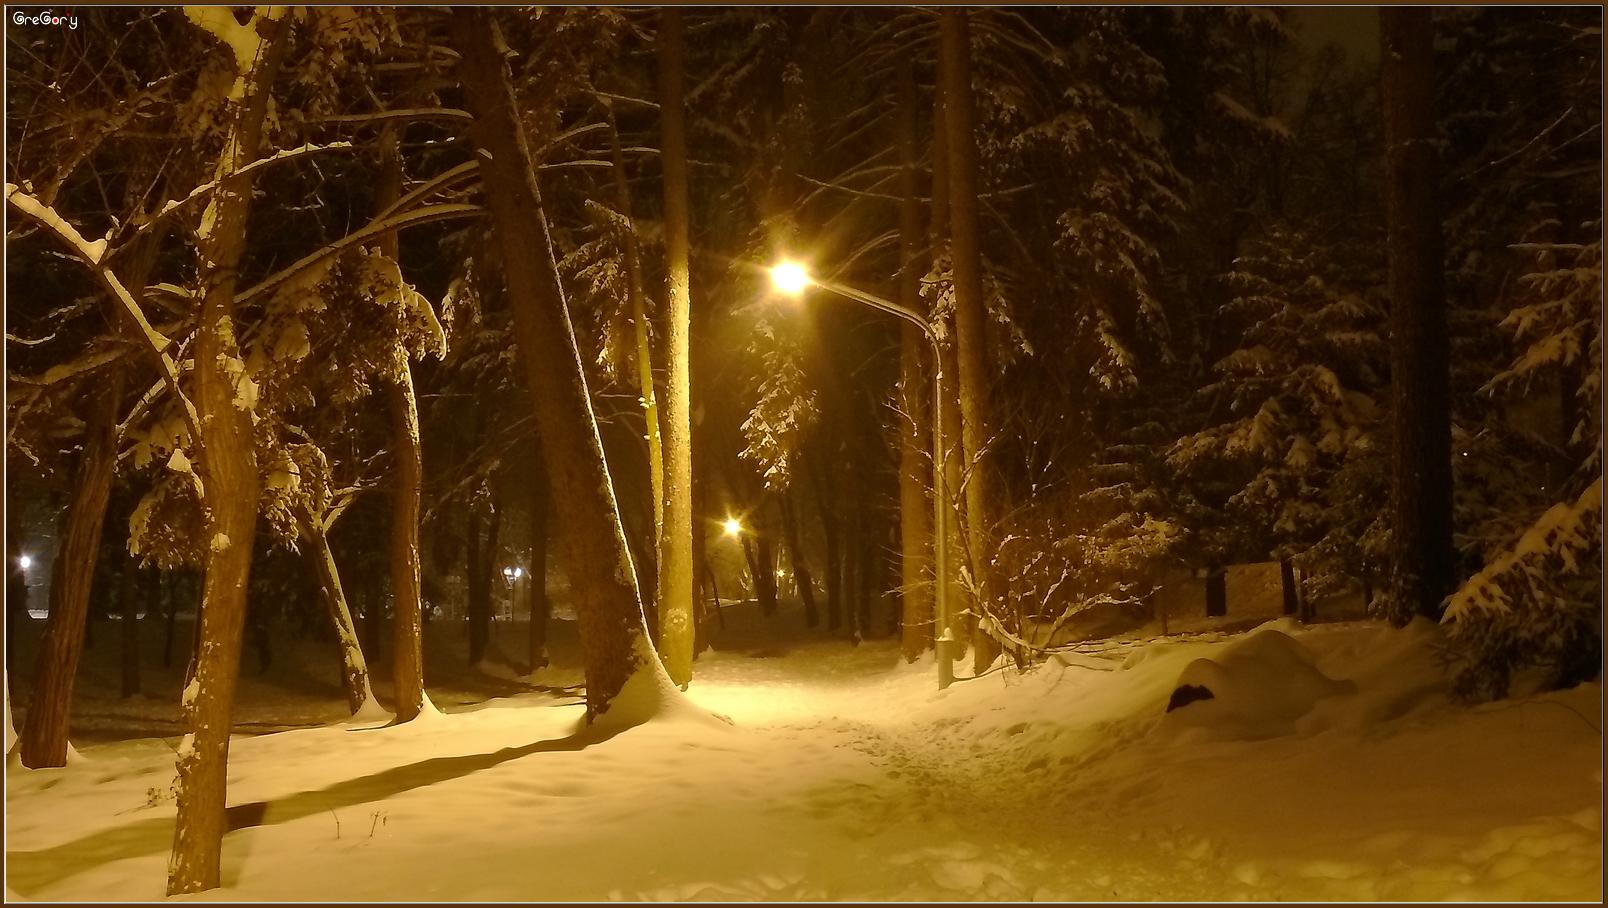 Парк у м. Вінниці / Park in Vinnytsya05.02.2012 19:28:26